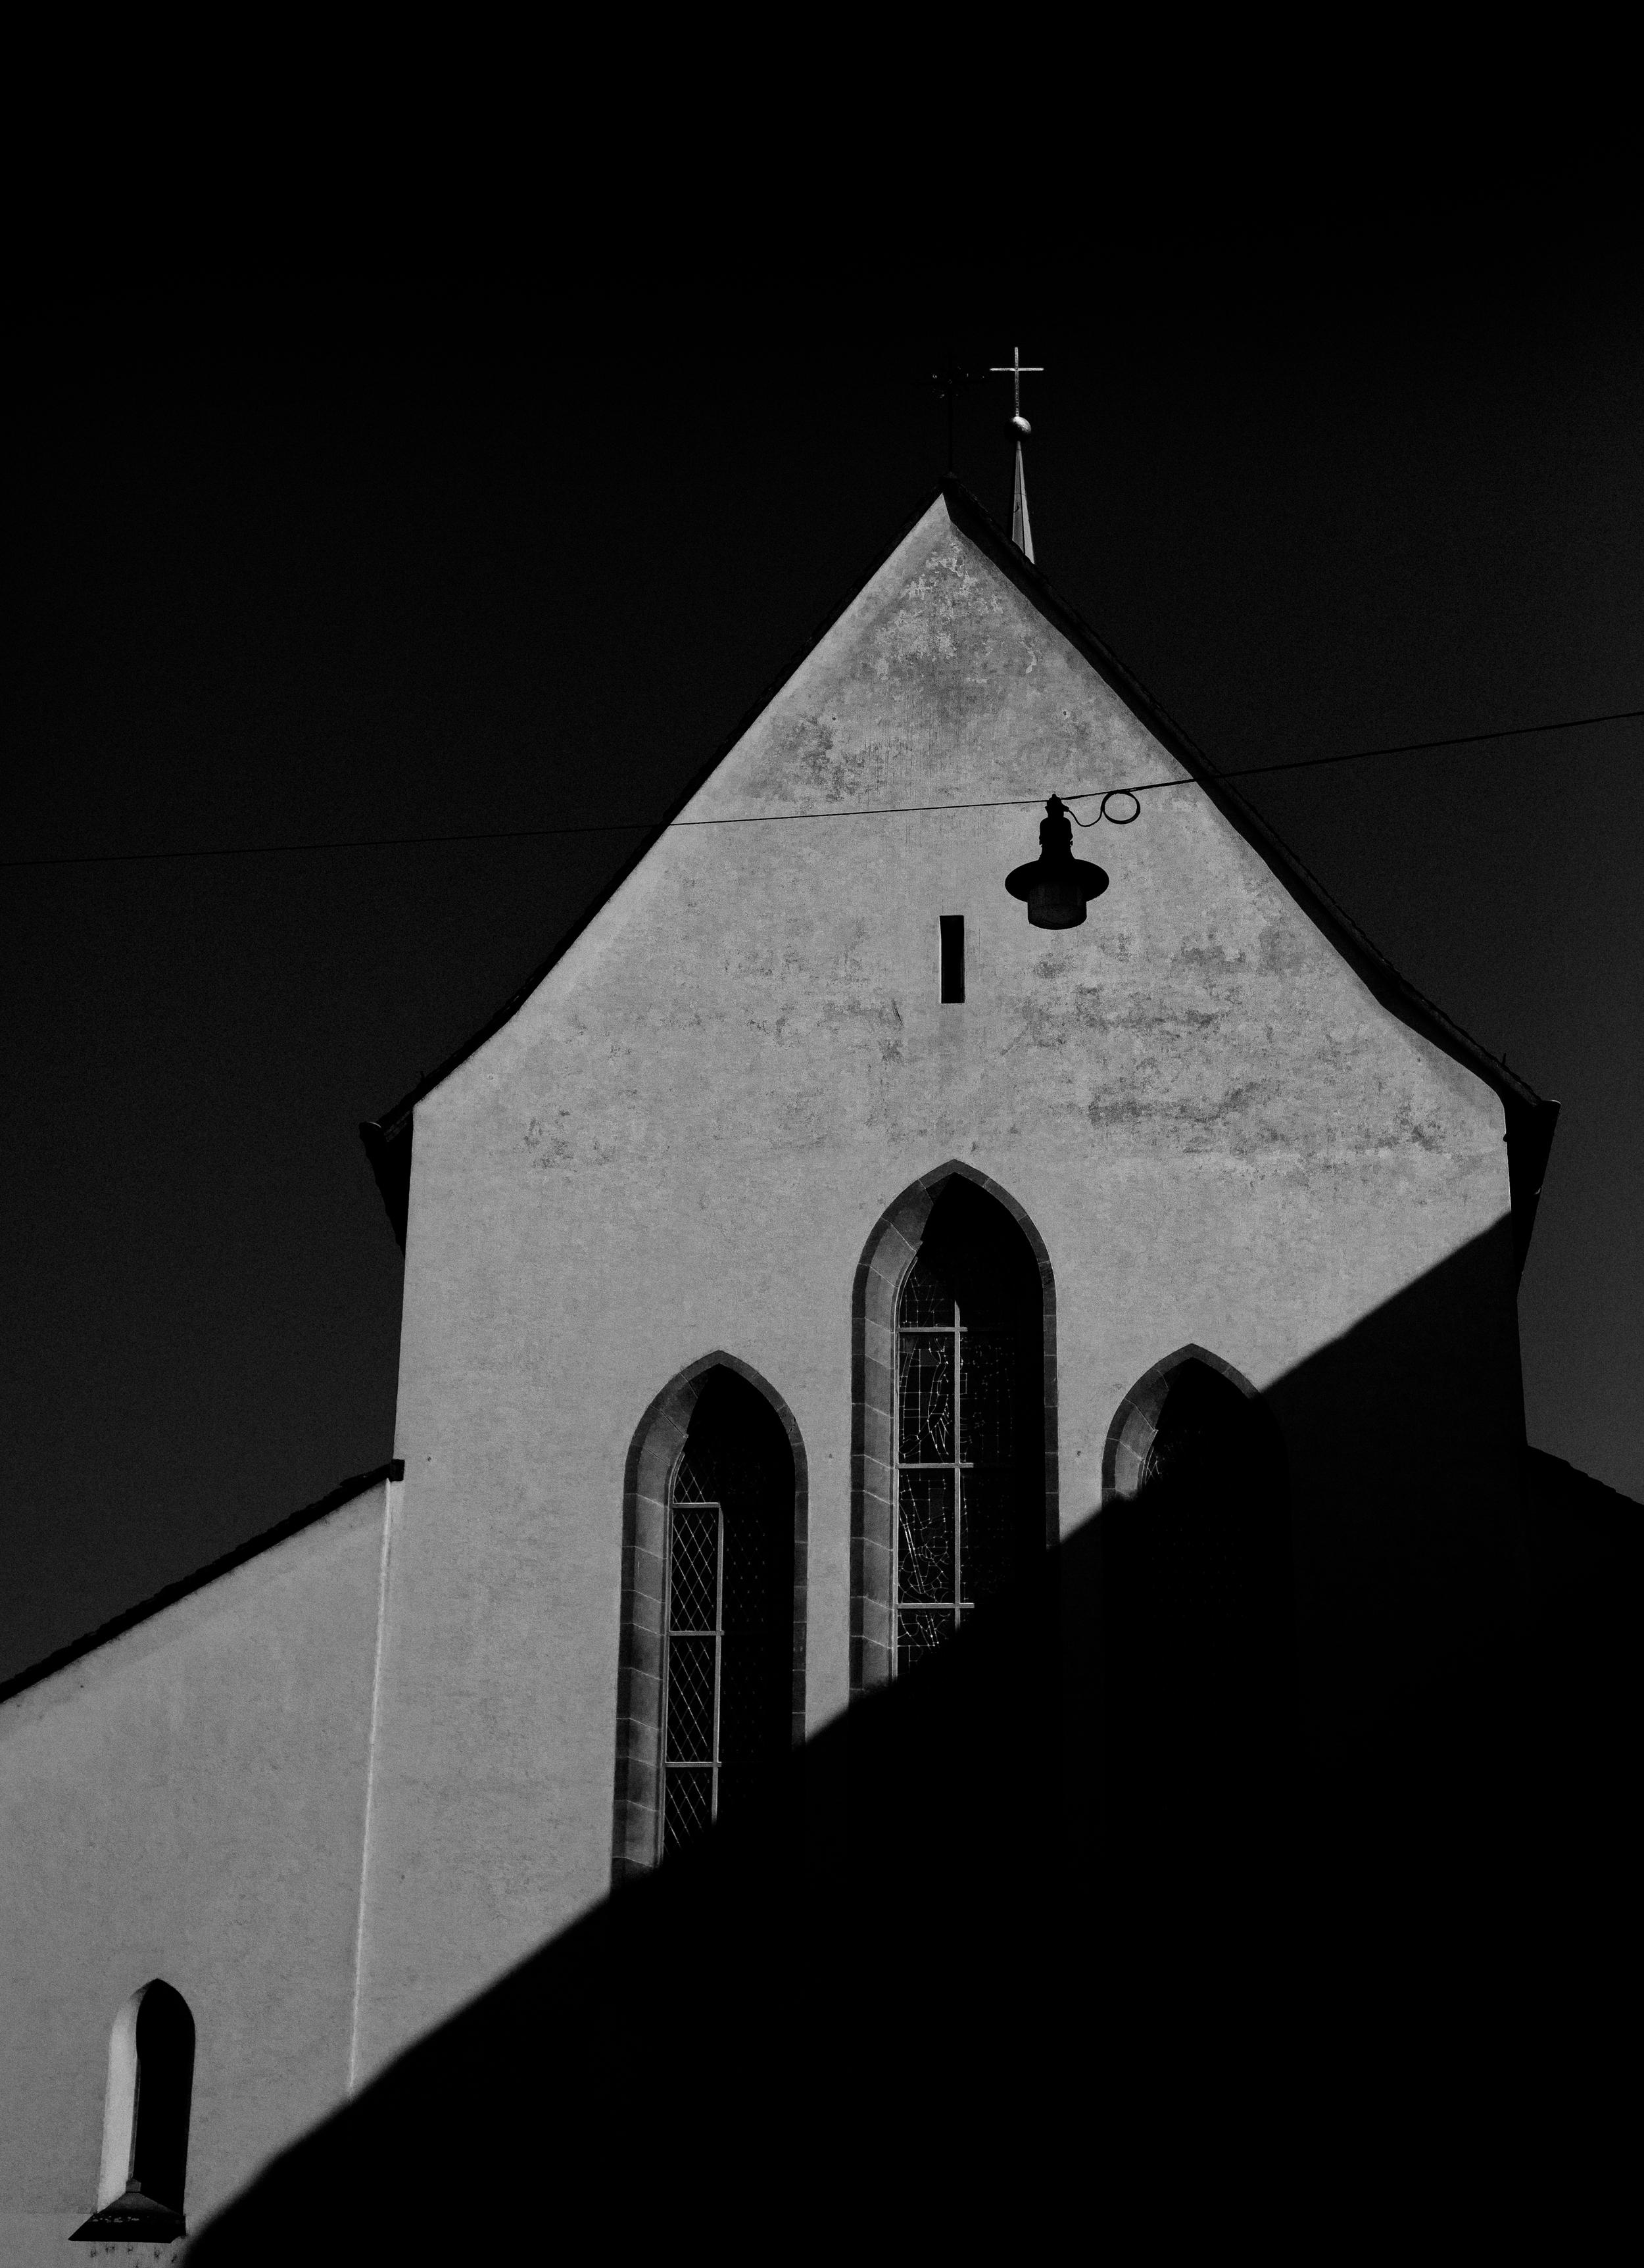 20111023-IMG_0023.jpg